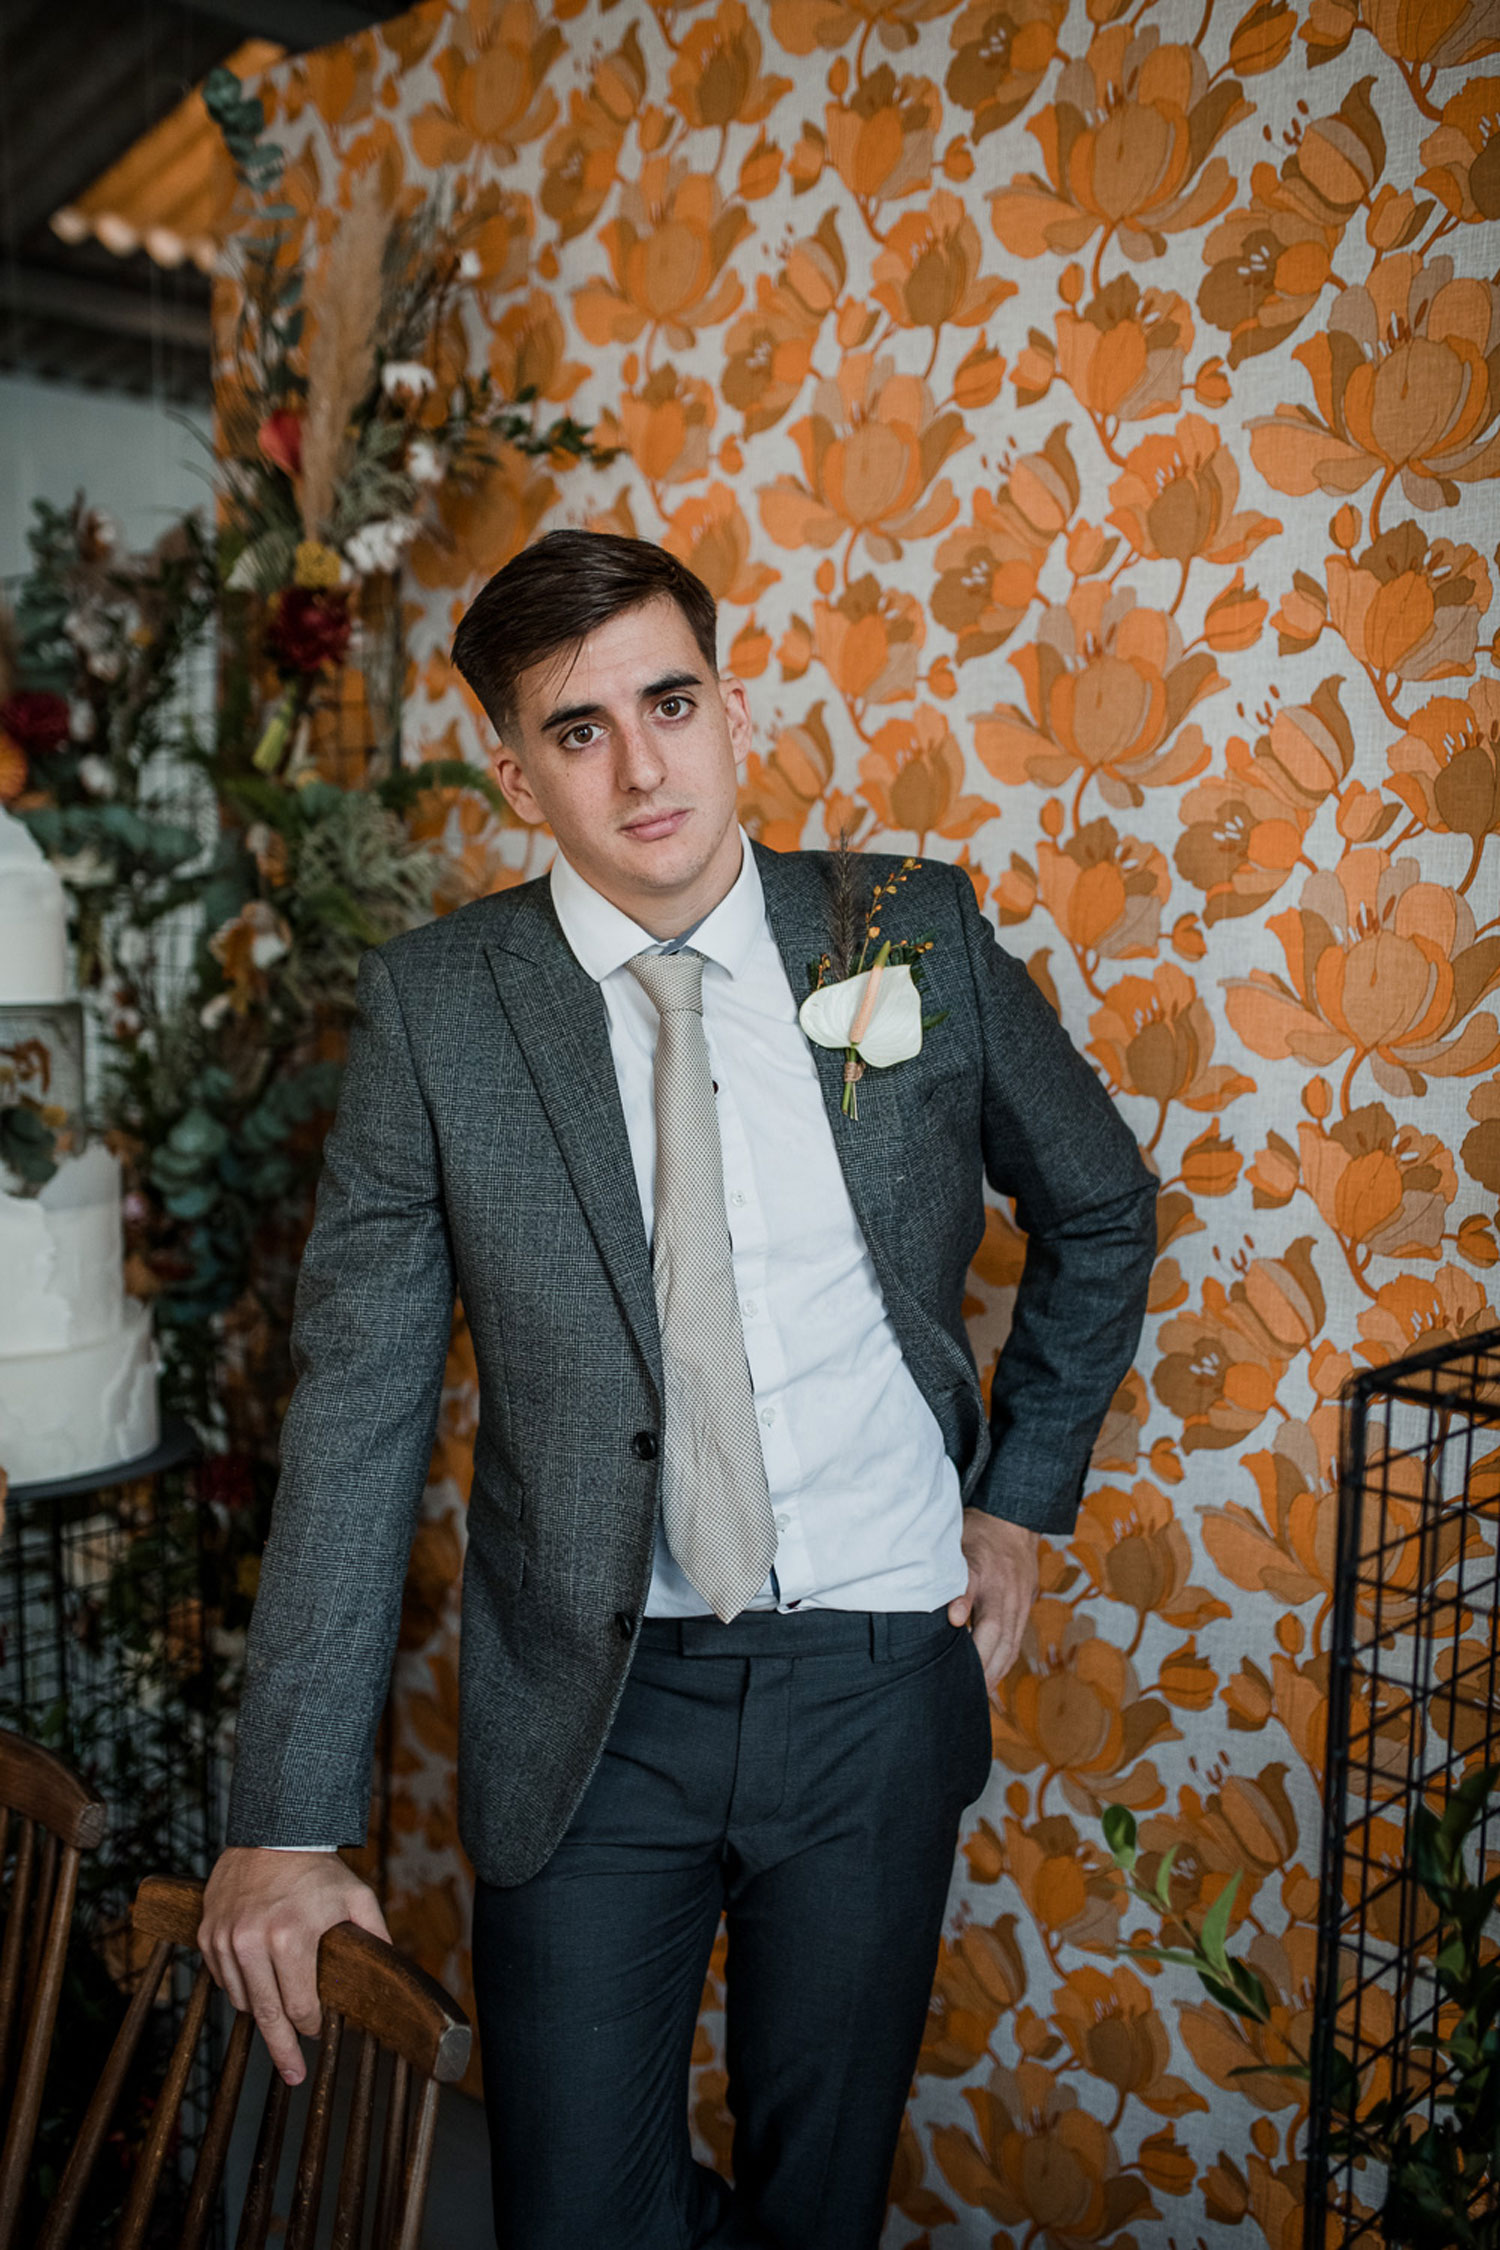 buttonhole groom wedding florist london mid century 1970s flowers